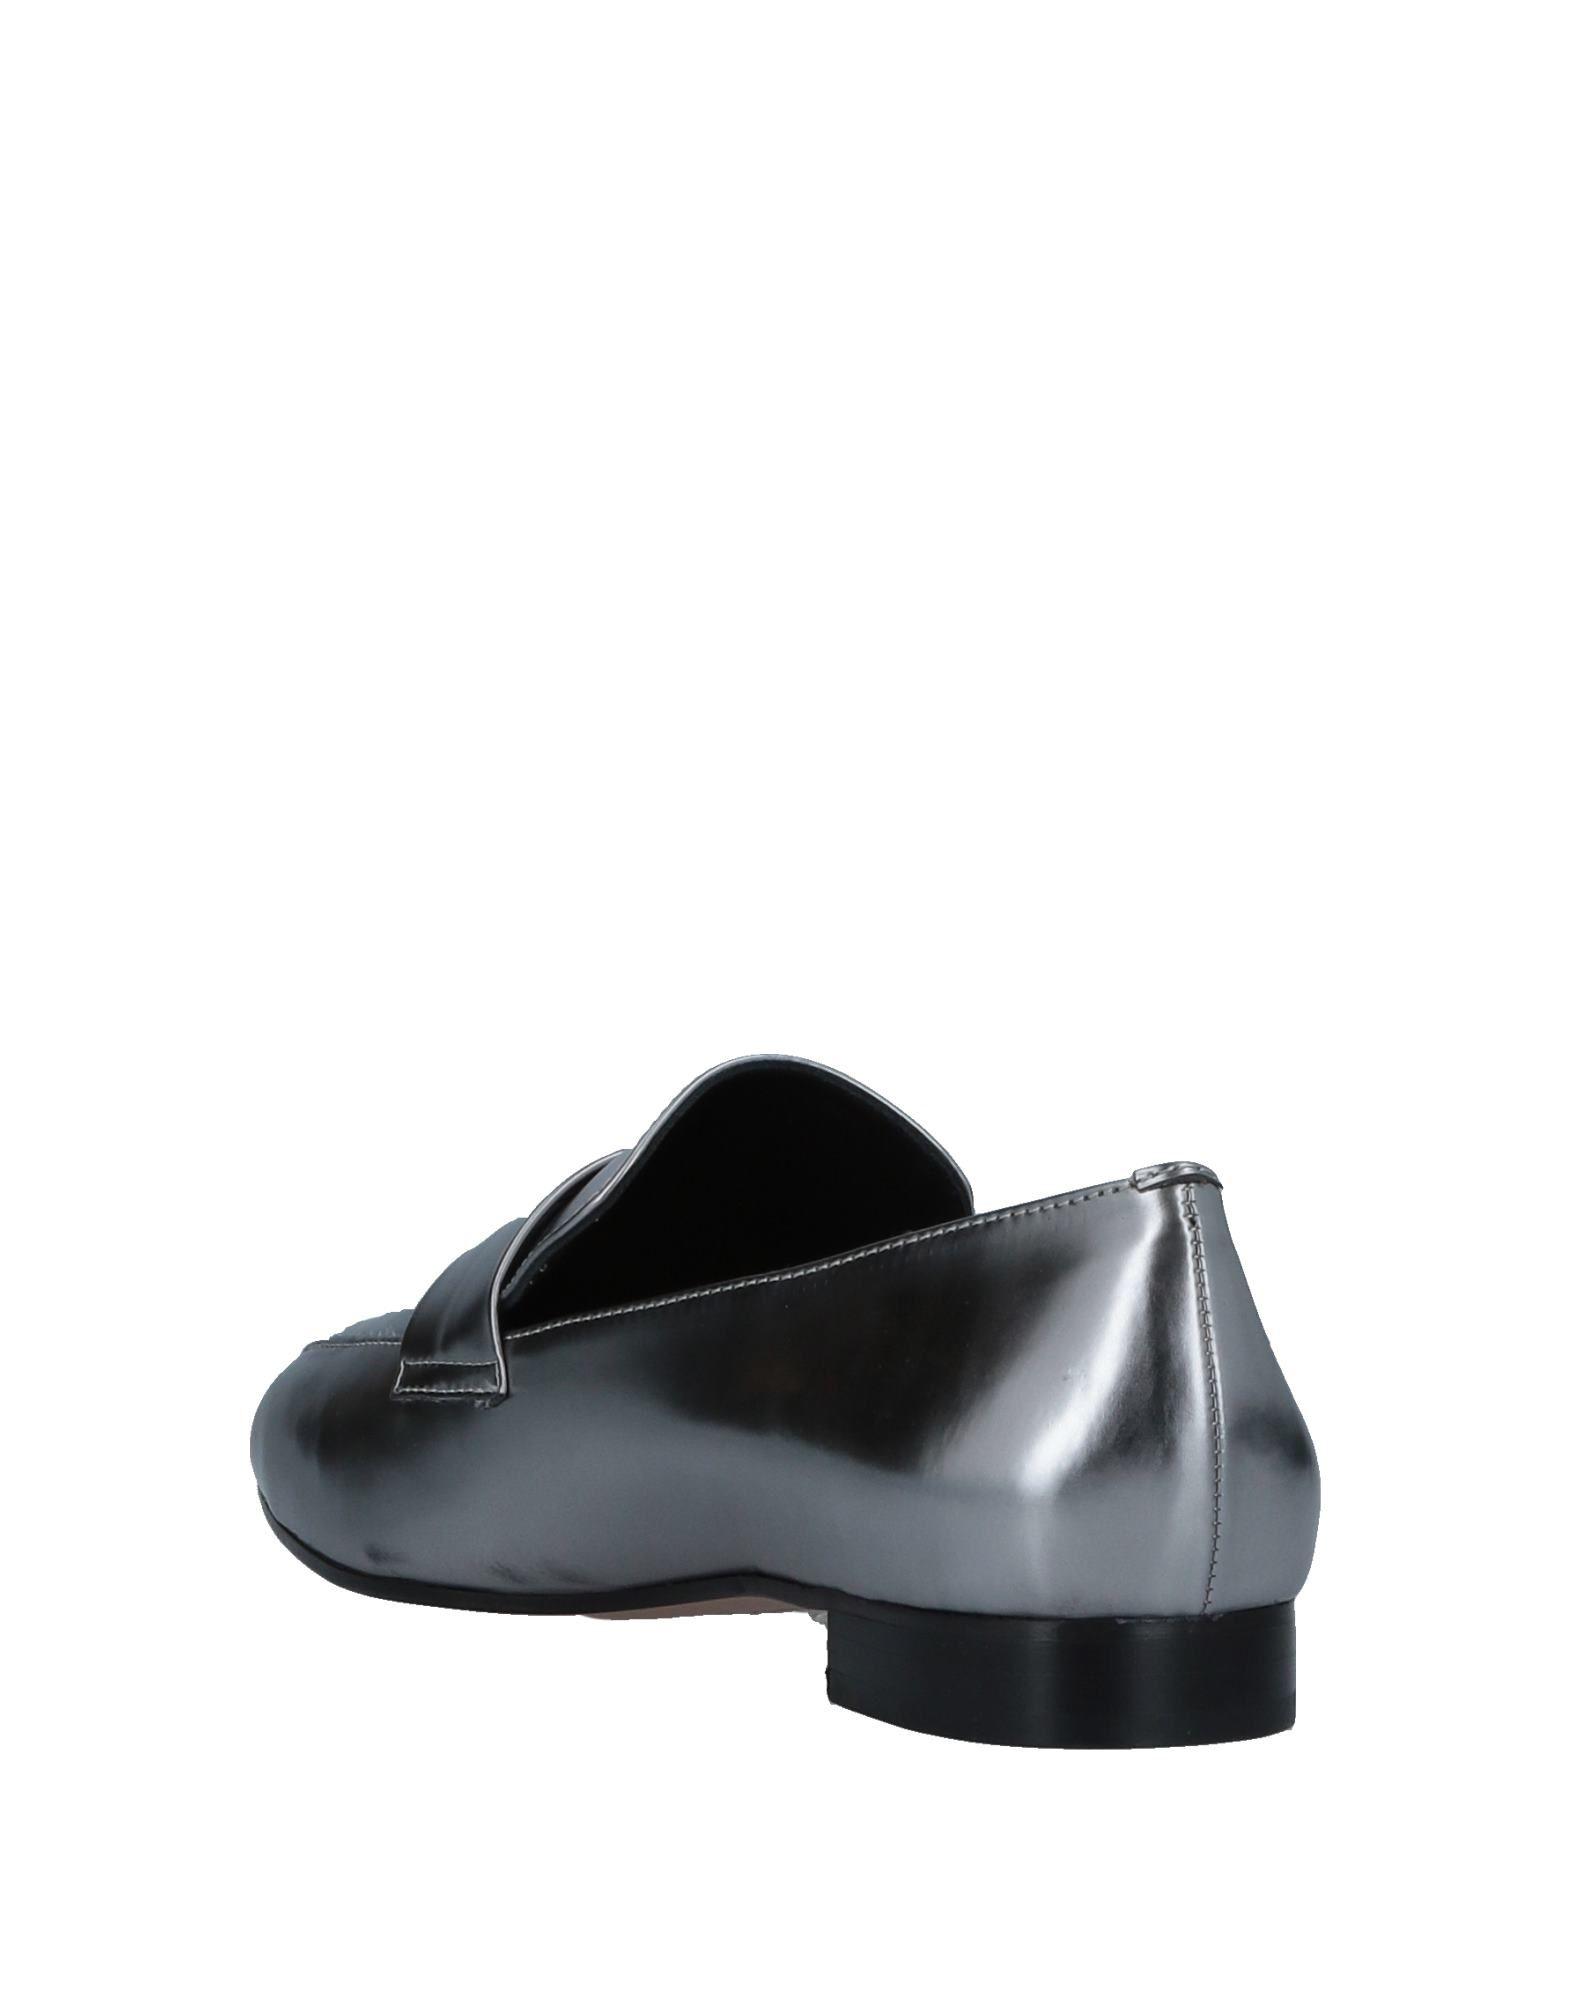 Fabio Rusconi Mokassins Damen  Schuhe 11532238MO Gute Qualität beliebte Schuhe  e5a34e